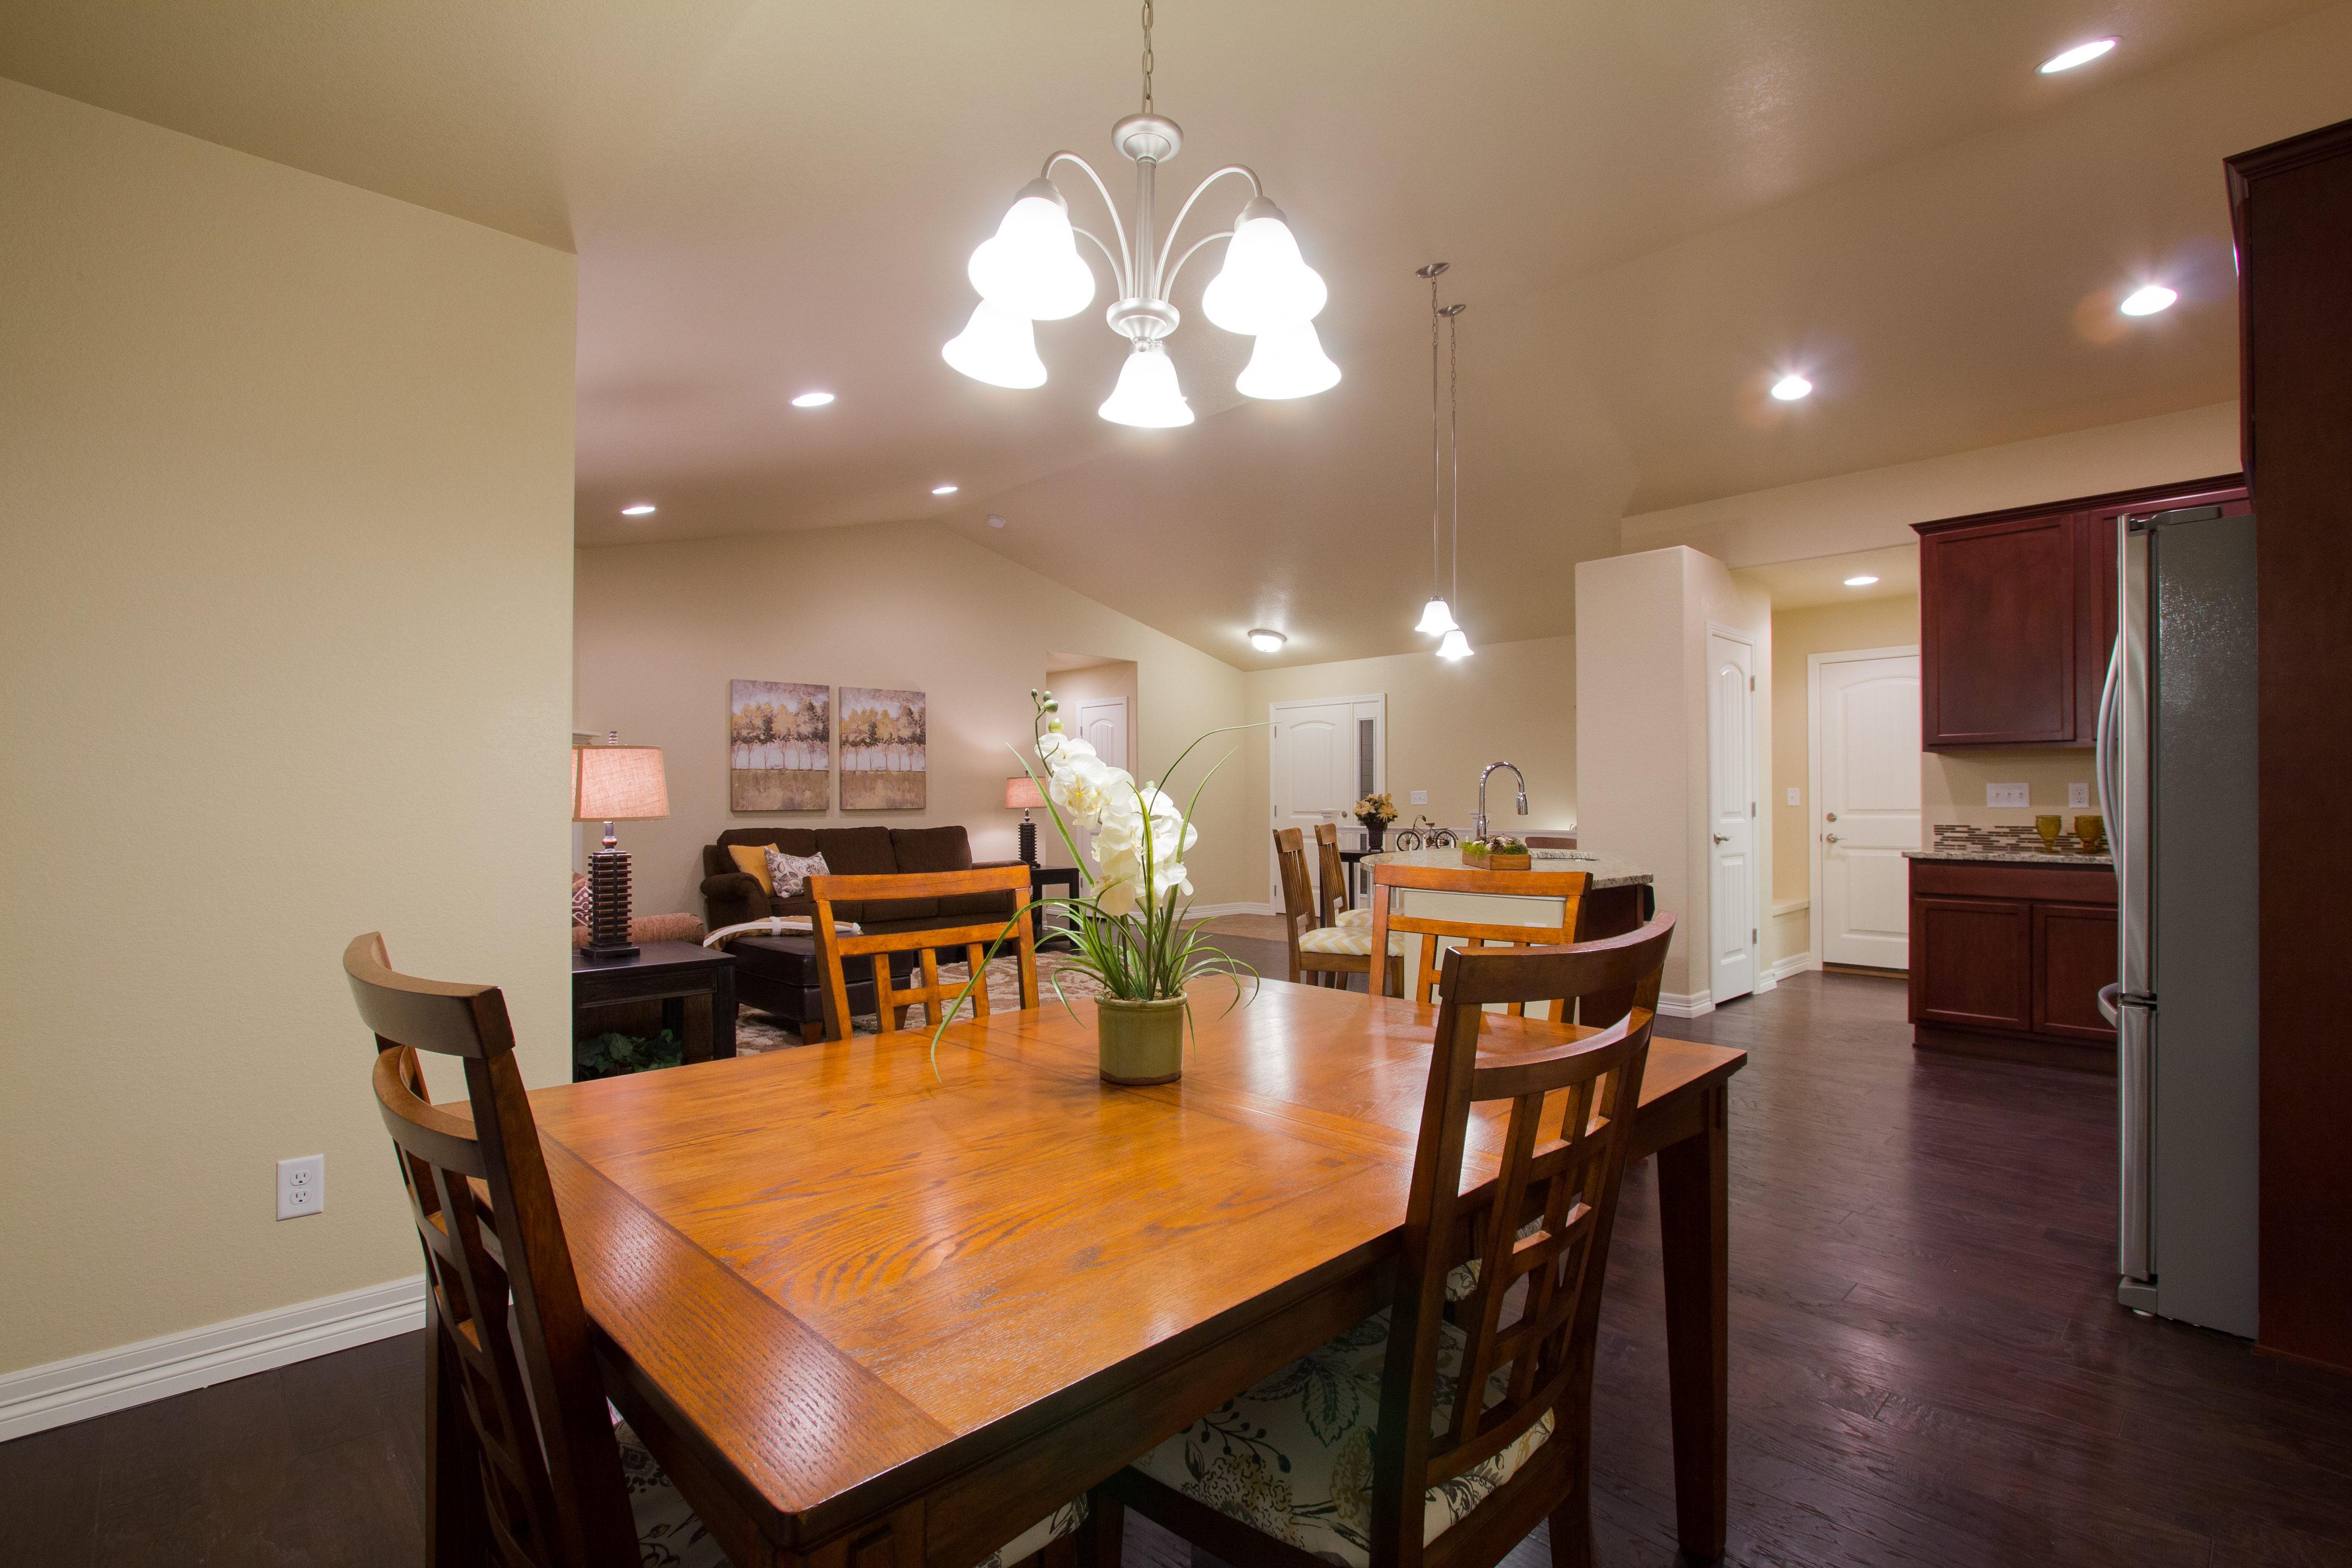 10-silverthorne-milliken-kitchen_dining-new_houses_for_sale